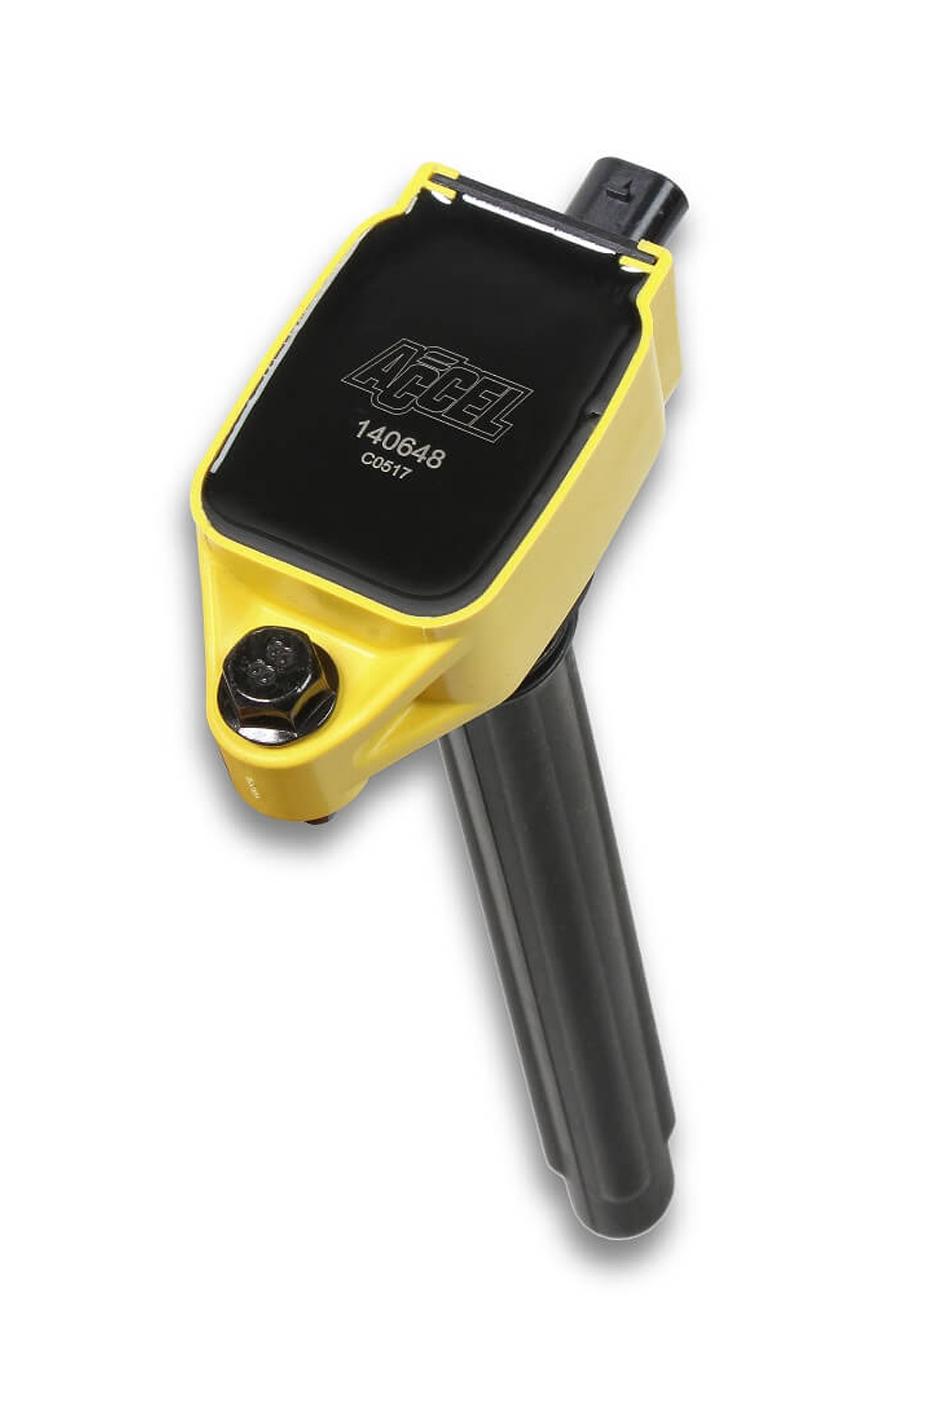 Accel 140648 Ignition Coil Pack, Super Coil, Coil-On-Plug, Yellow, 3.6 L, Mopar 2011-16, Each